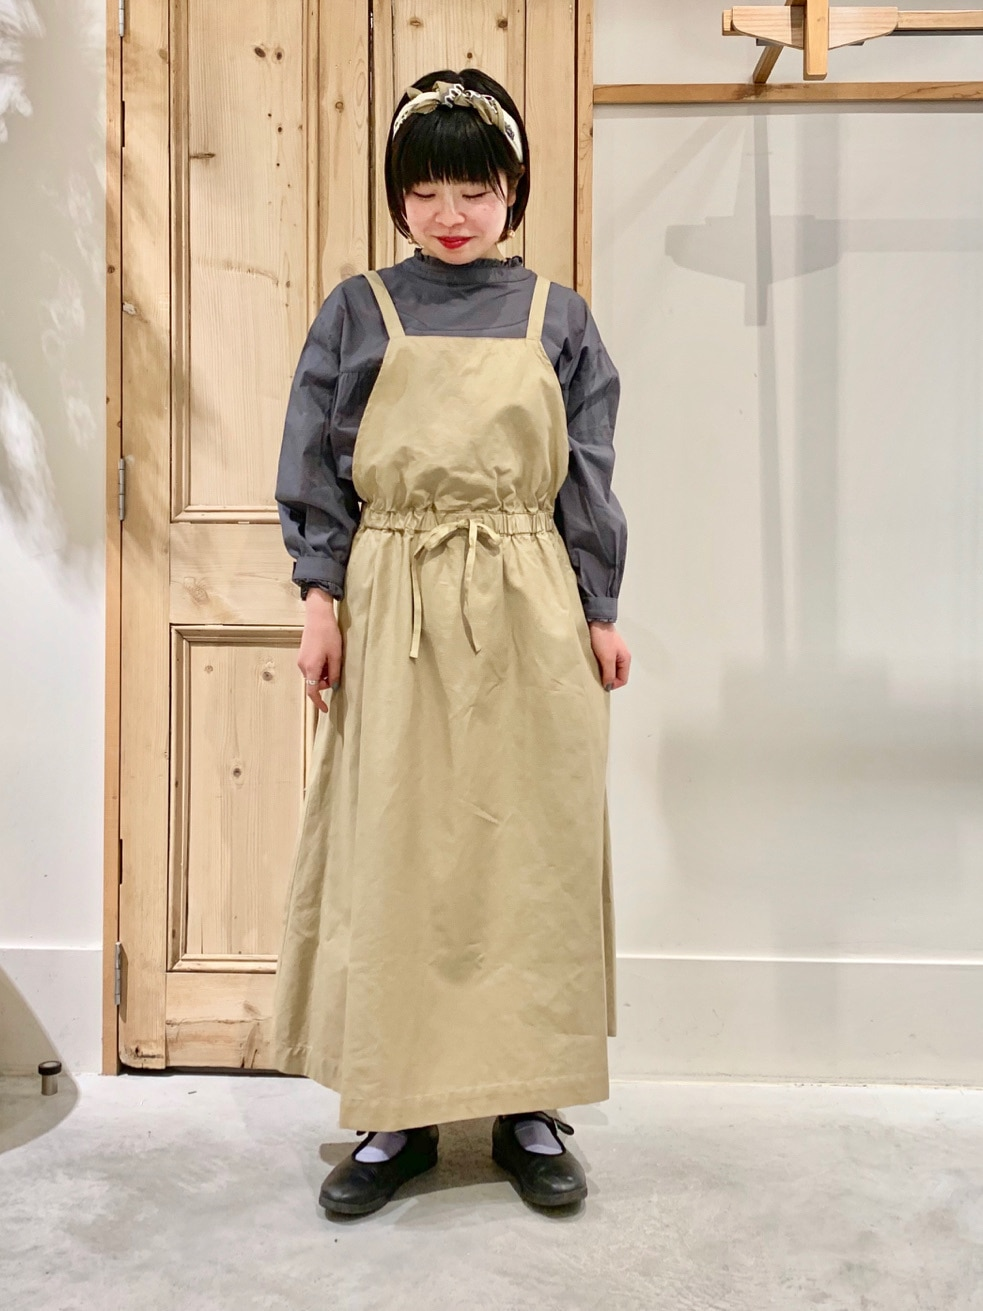 Malle chambre de charme 調布パルコ 身長:153cm 2021.01.28